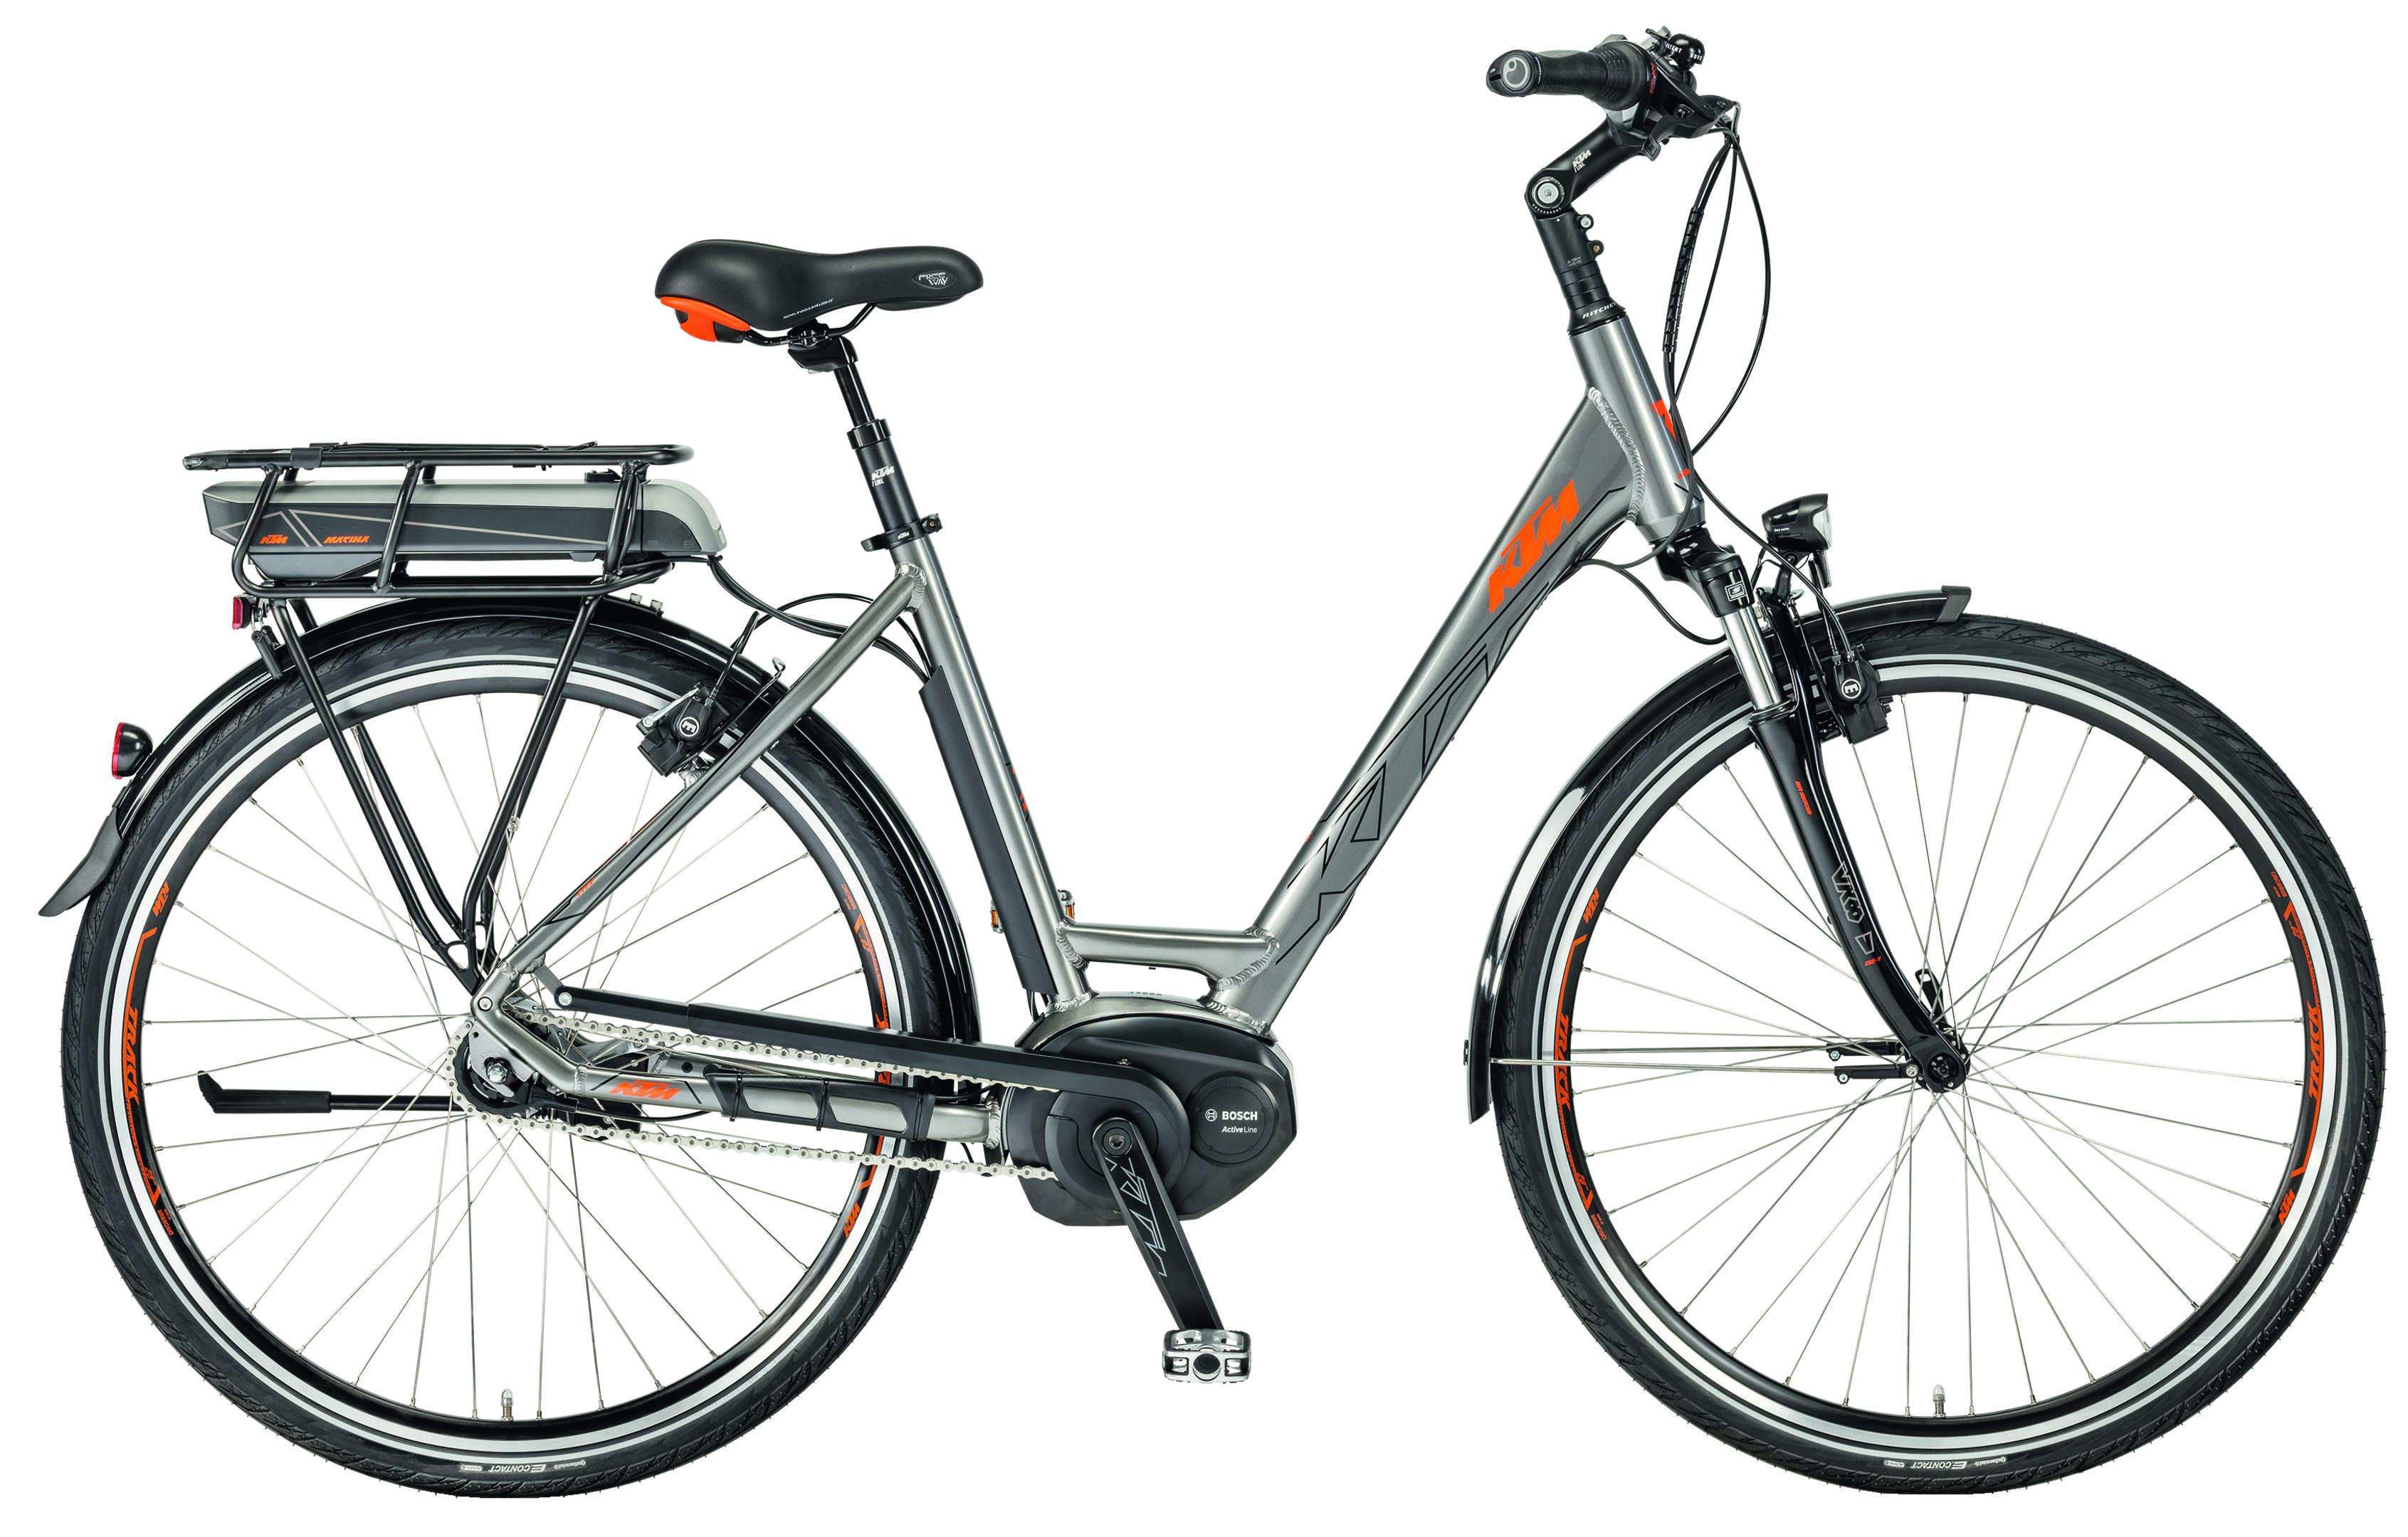 ktm e bike macina city 7 rt a4 eurorad bikeleasingeurorad bikeleasing. Black Bedroom Furniture Sets. Home Design Ideas